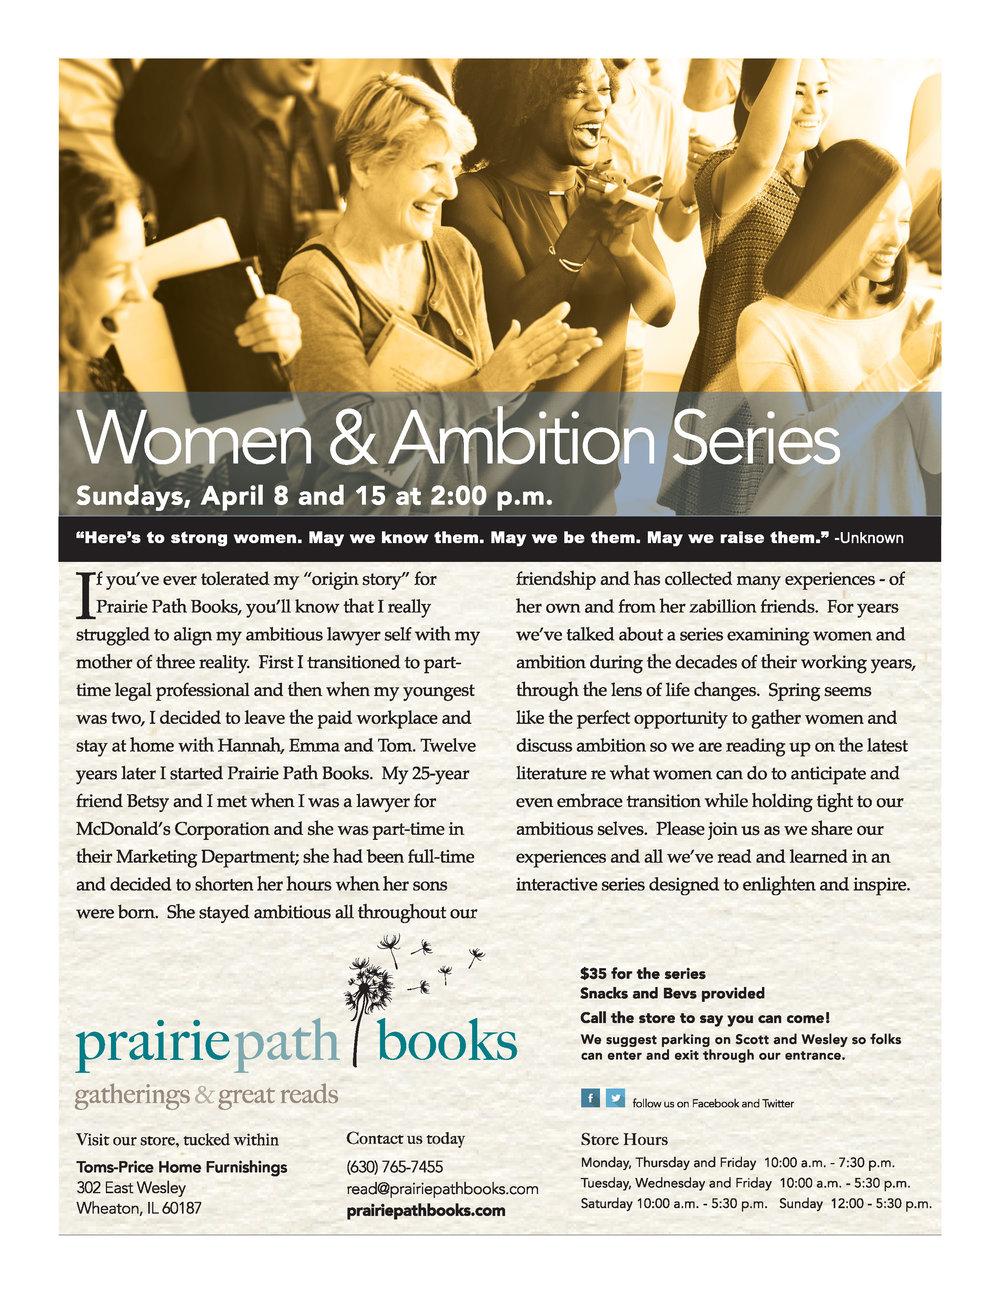 Women&AmbitionSeries.jpg